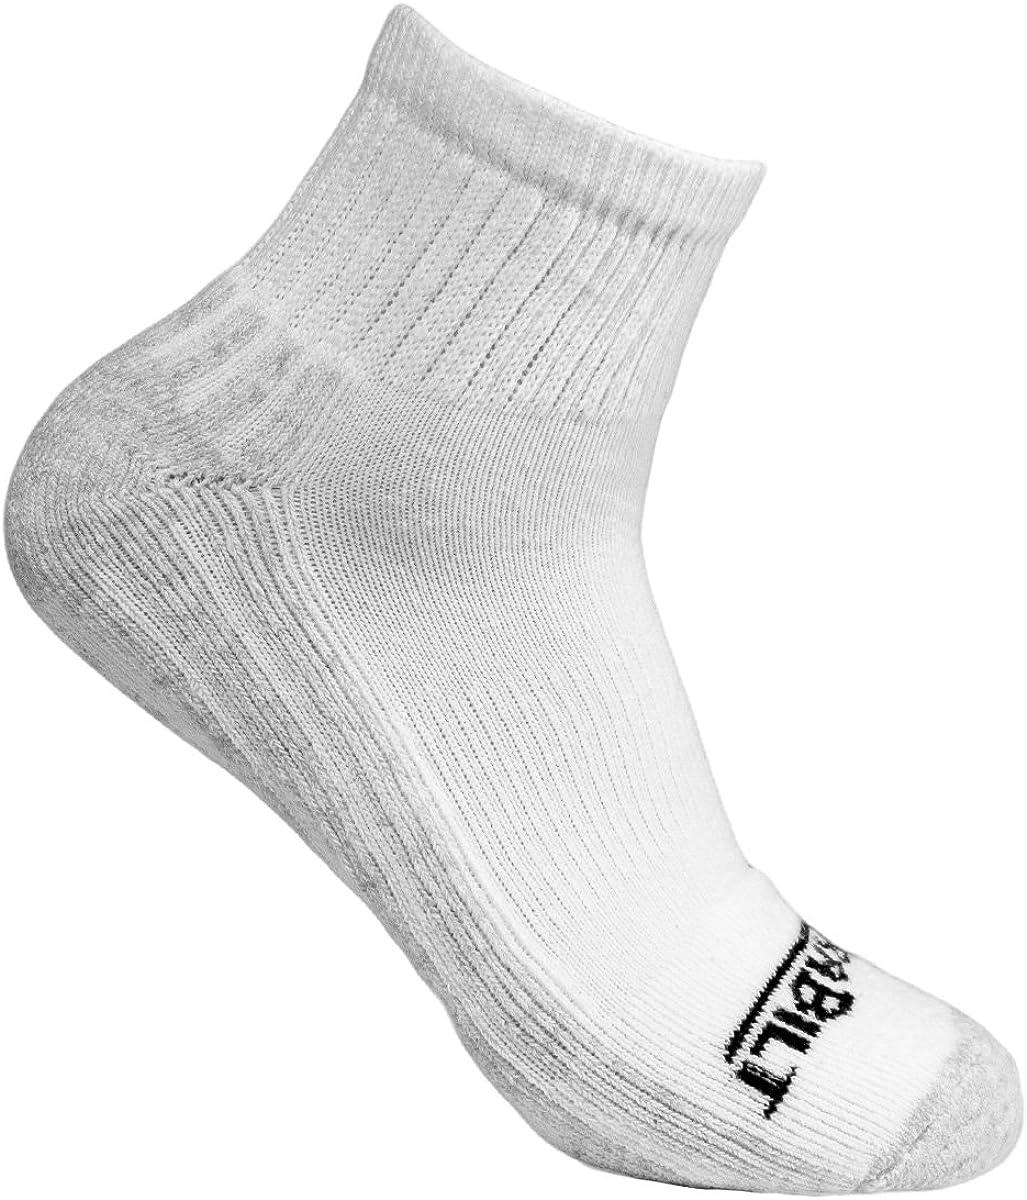 DURABILT Adult White Cotton Ankle Comfort Sport Sock 3pk Size 9-10